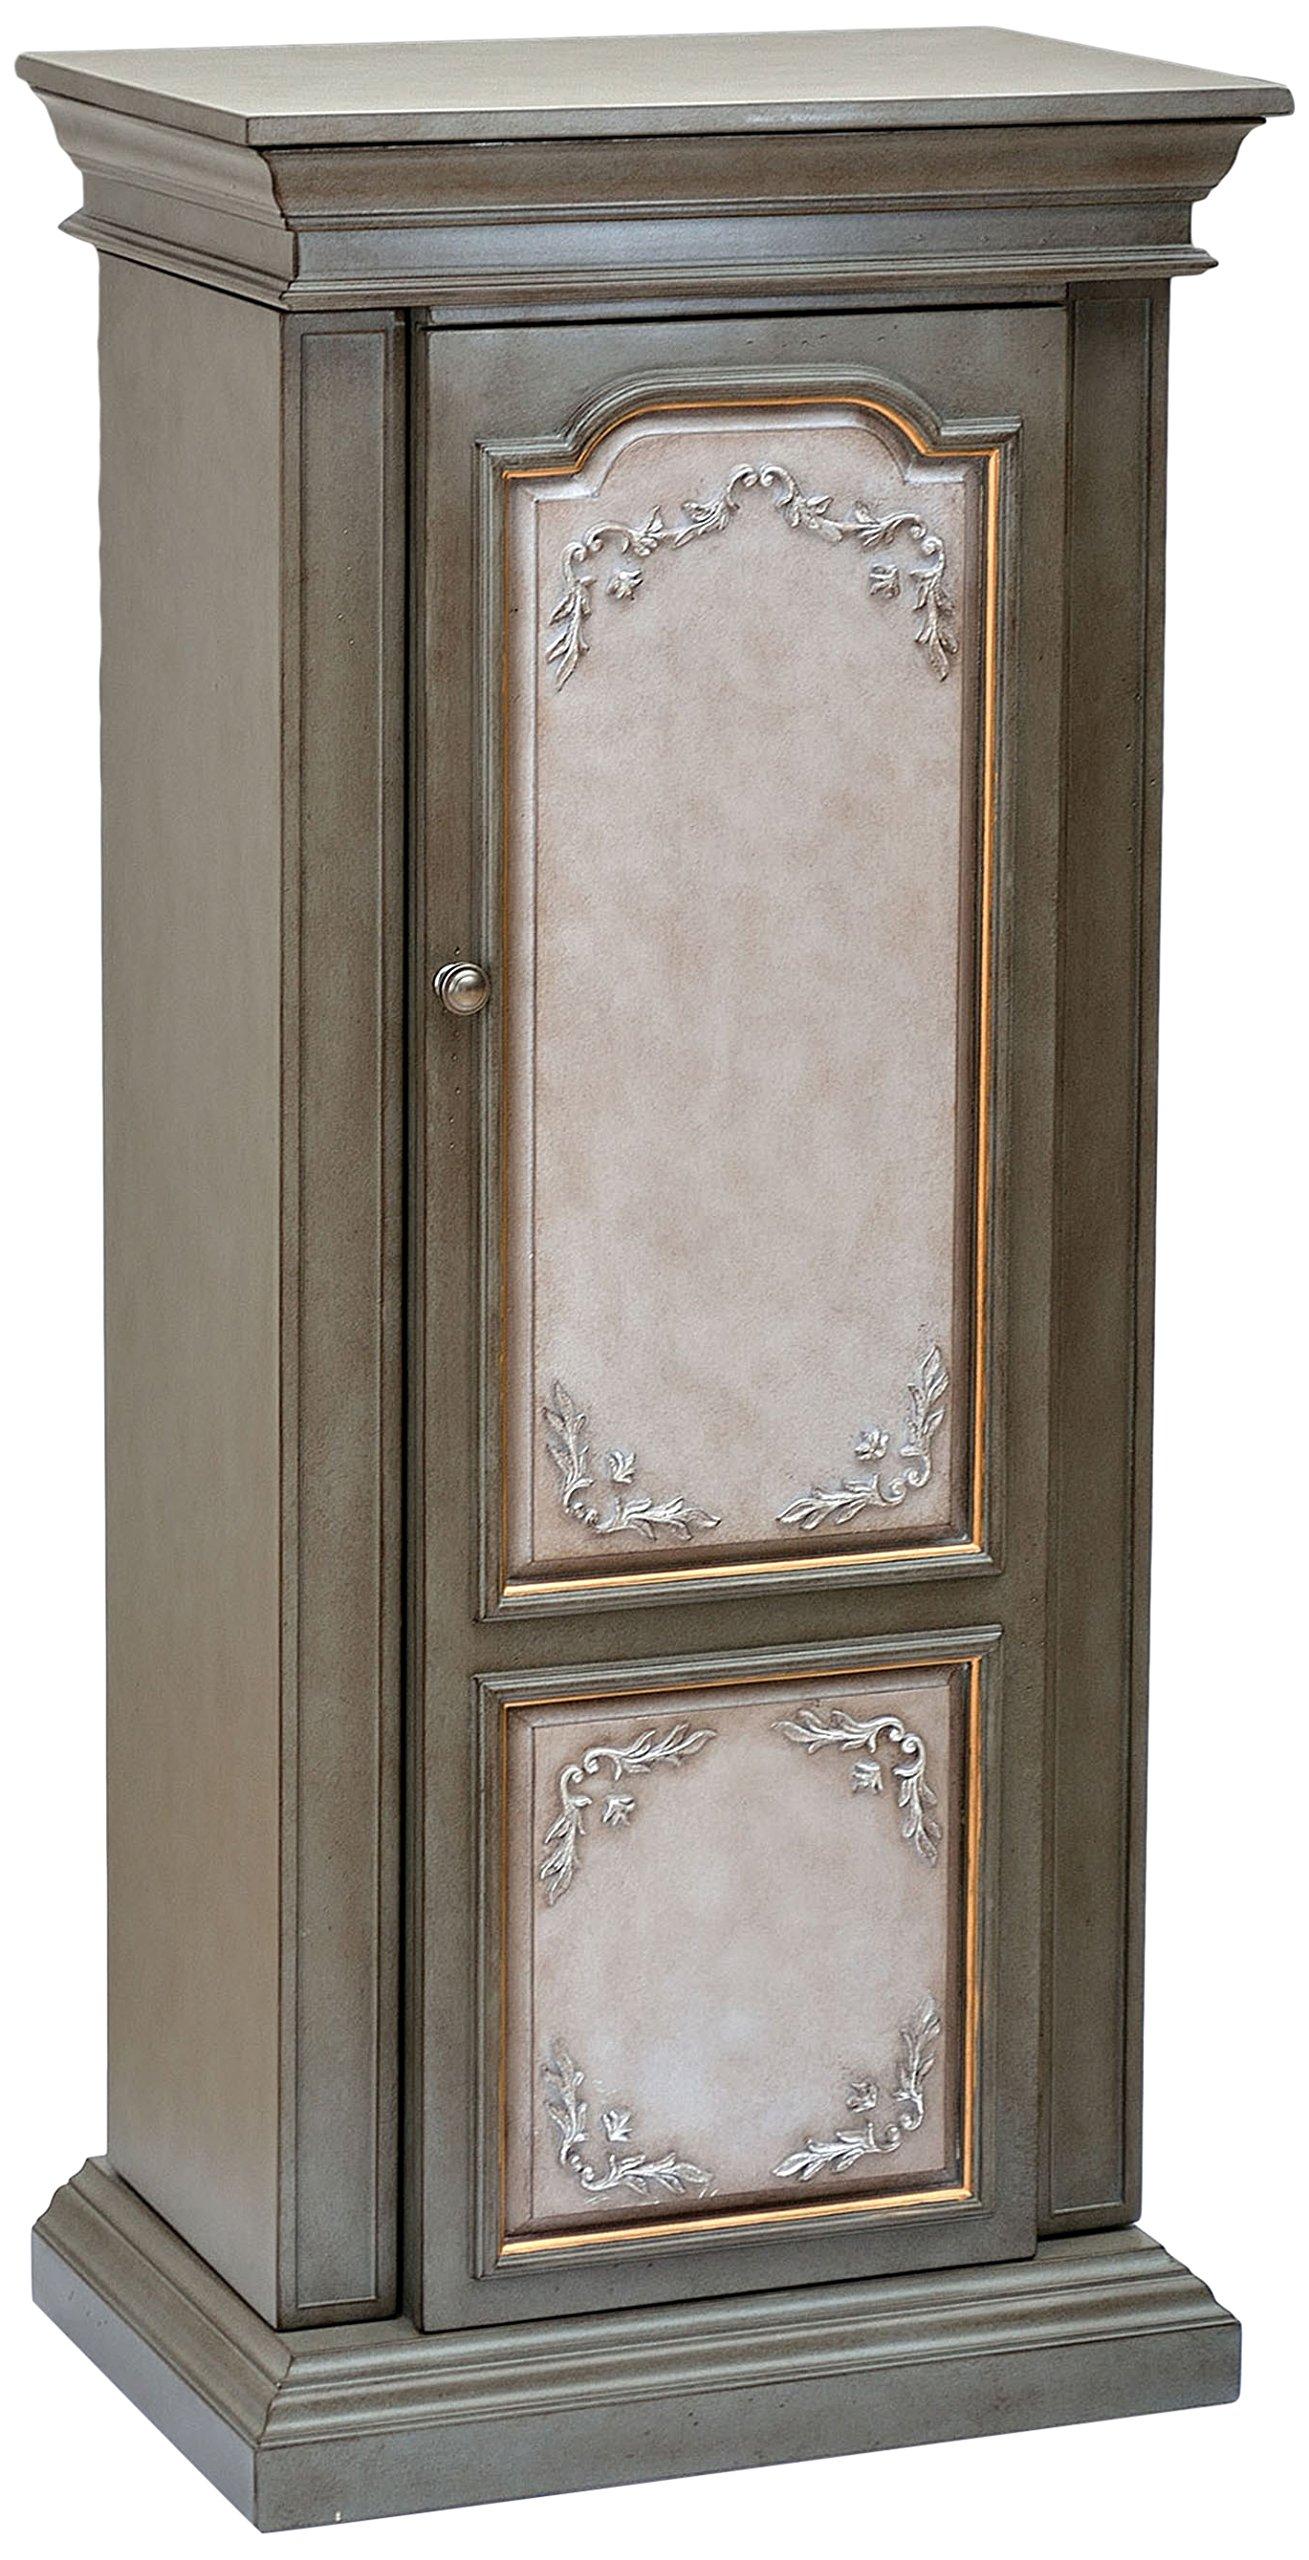 ACME Furniture 97206 Riker Jewelry Armoire, Antique Gray/Antique Beige